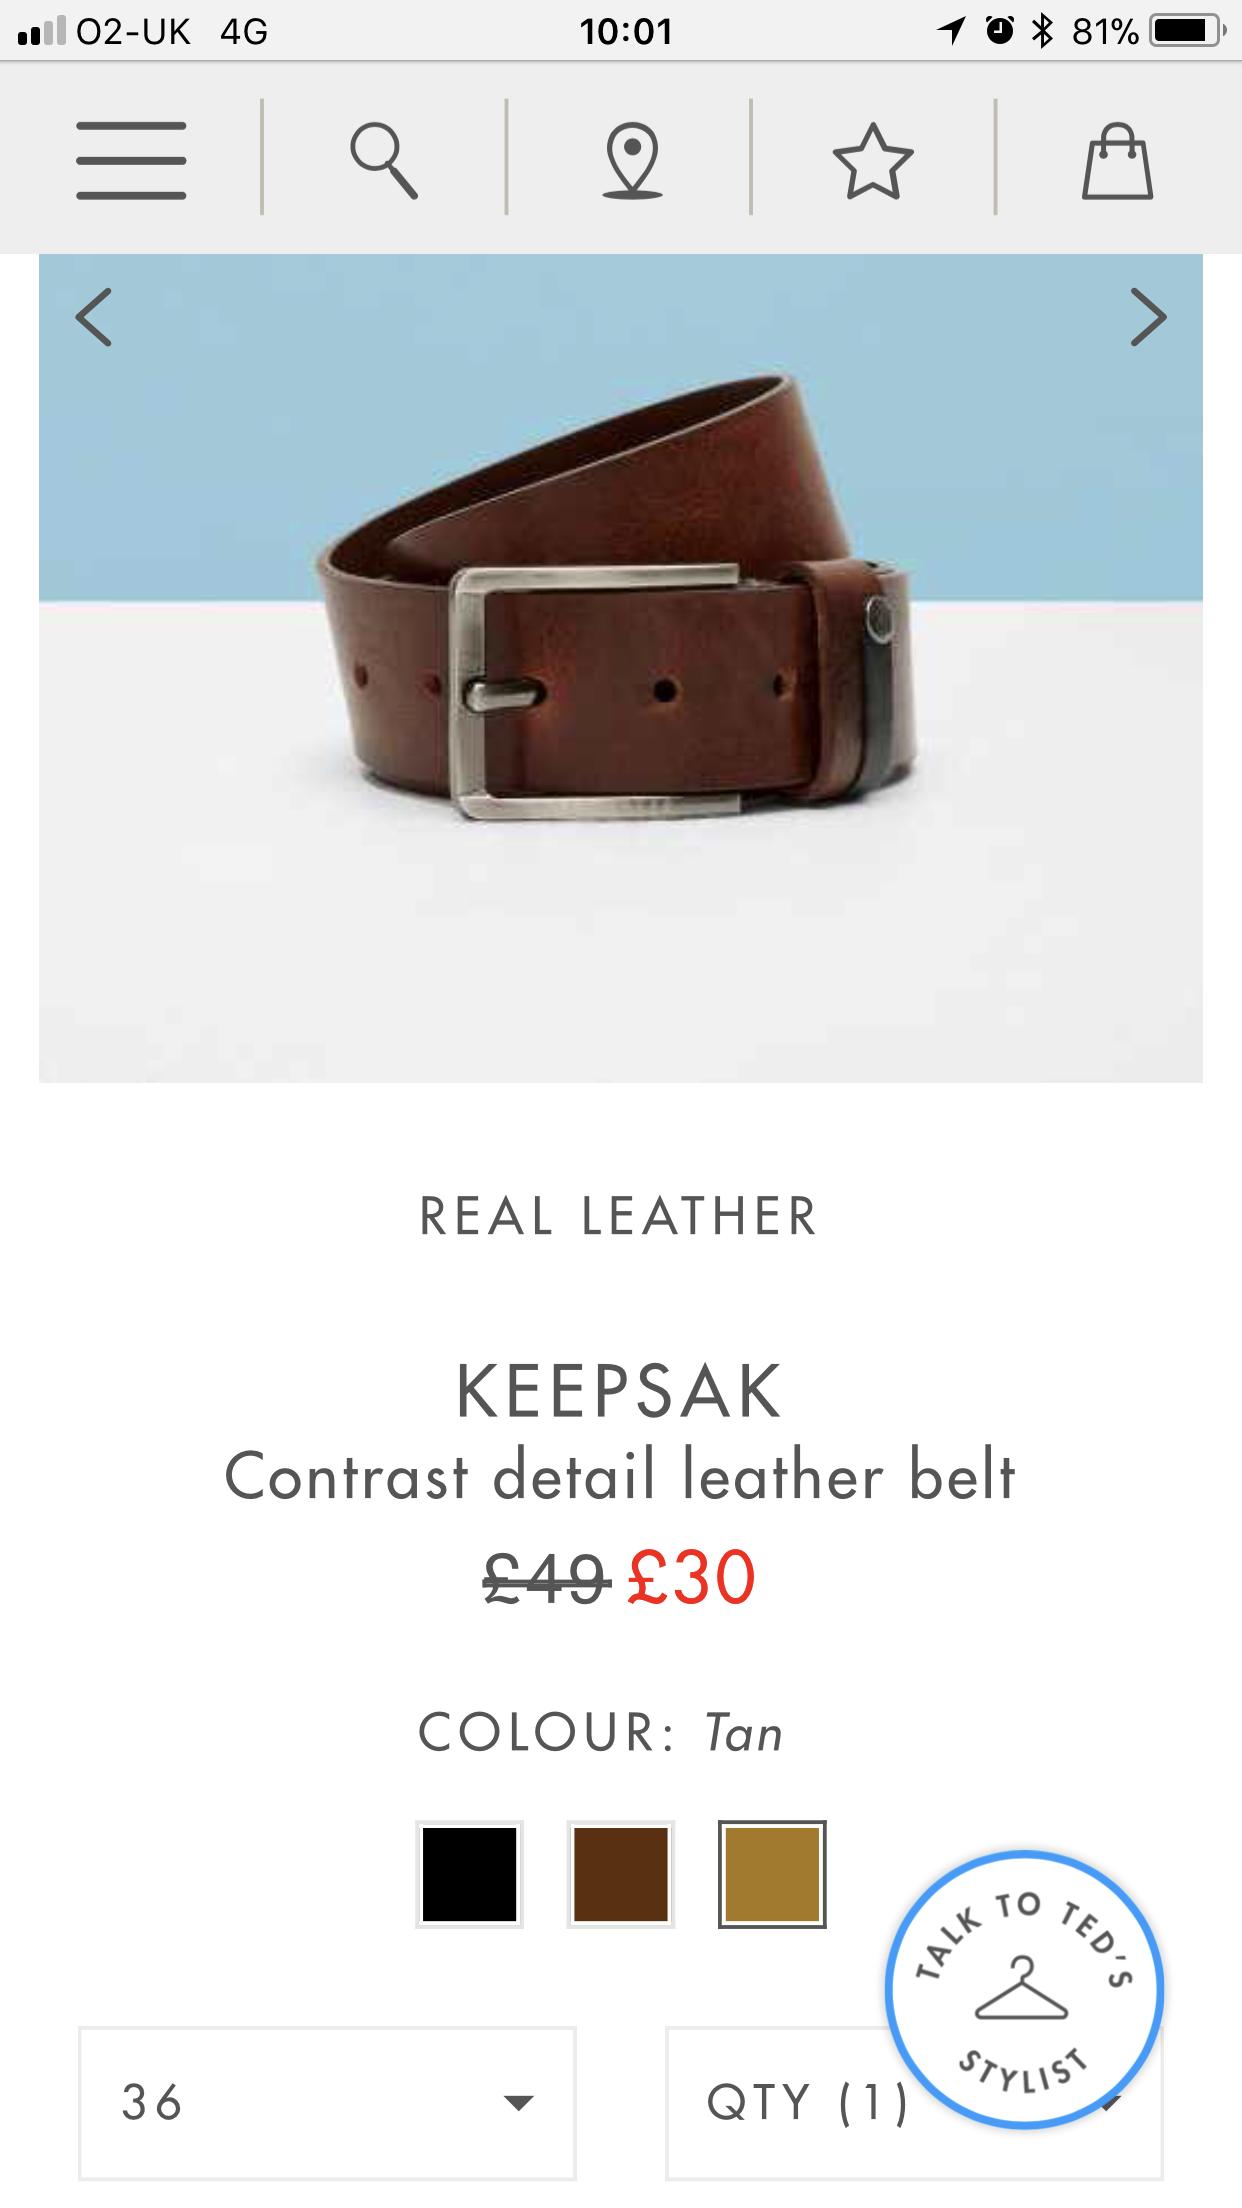 1d752d014 Ted Baker belt. Tan colour